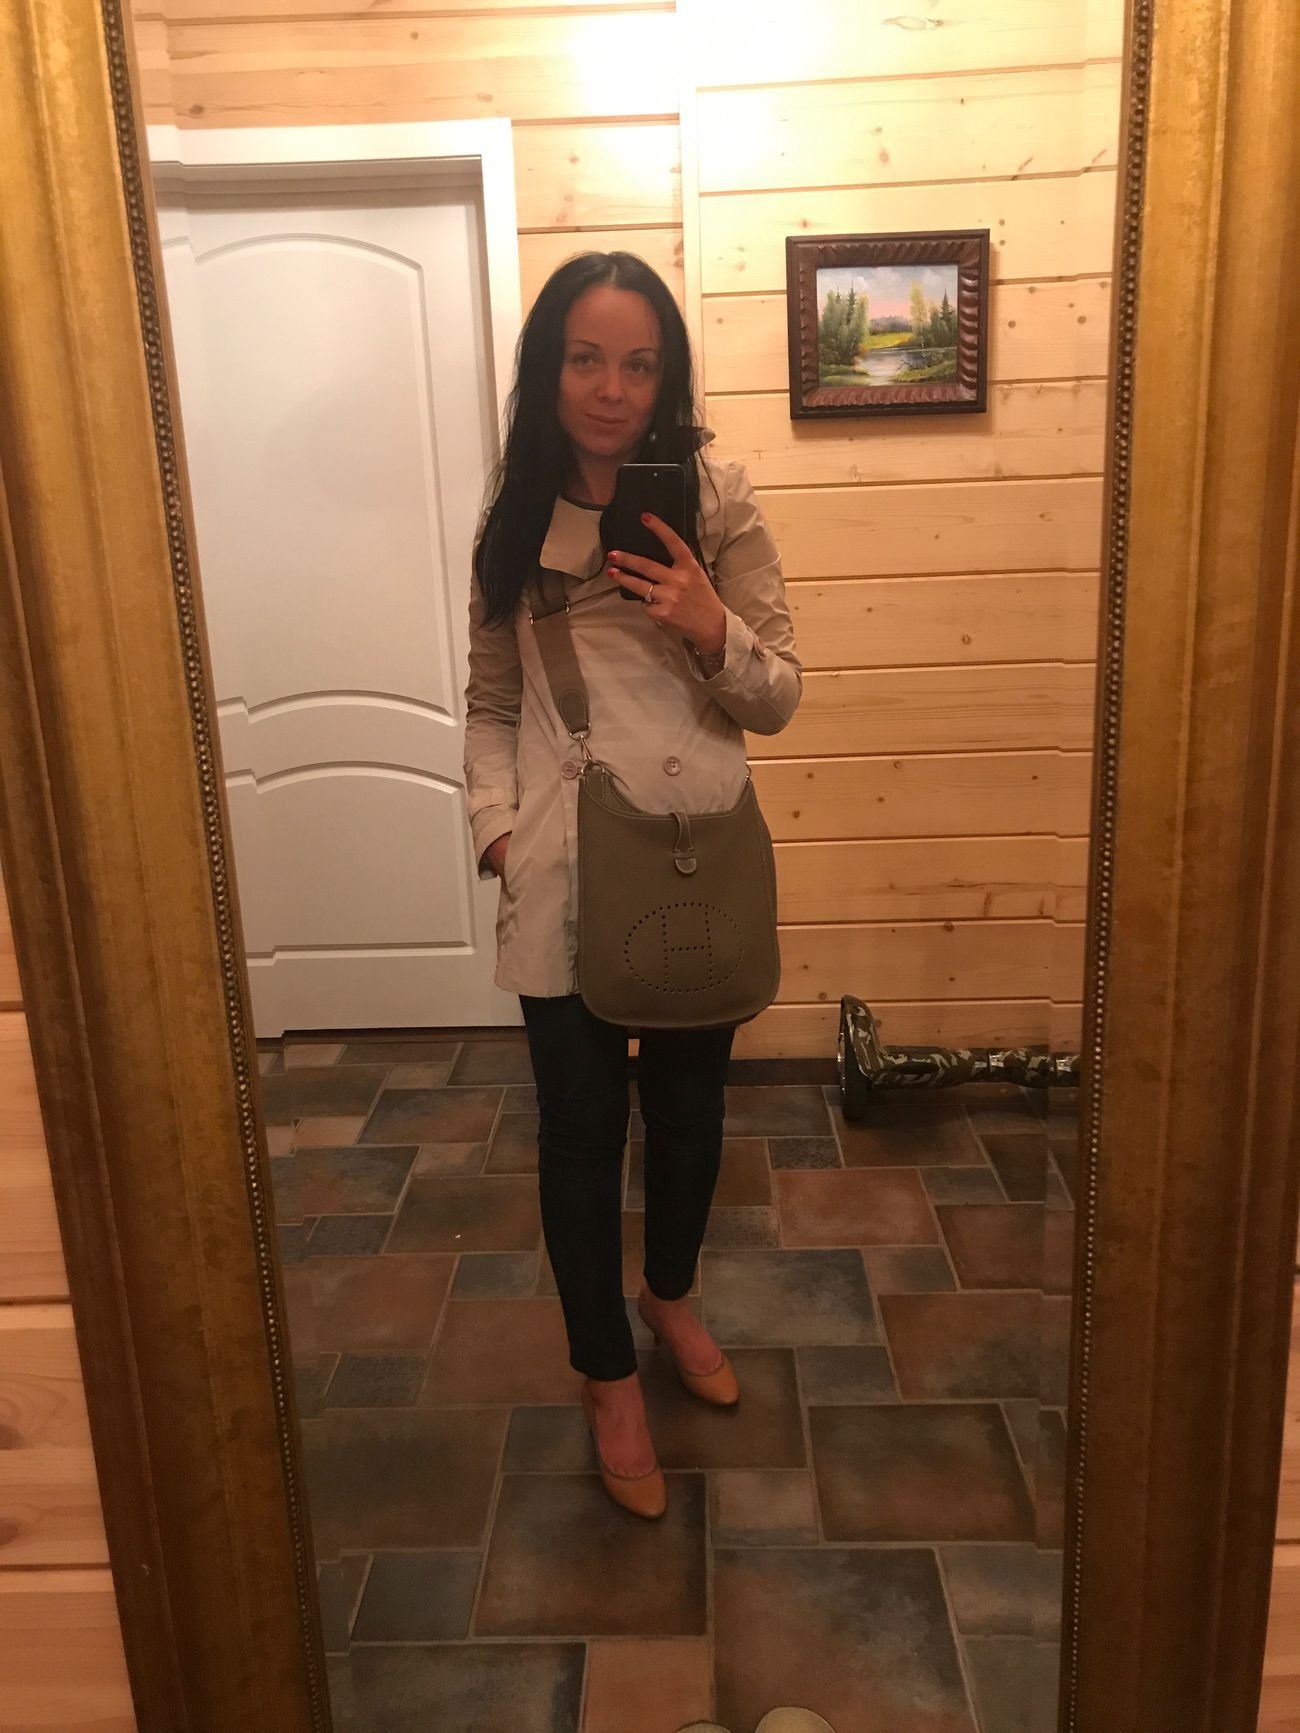 Mirror Selfie Hello World Russia россия Selfie ✌ Its Me ThatsMe Hi World Hi!